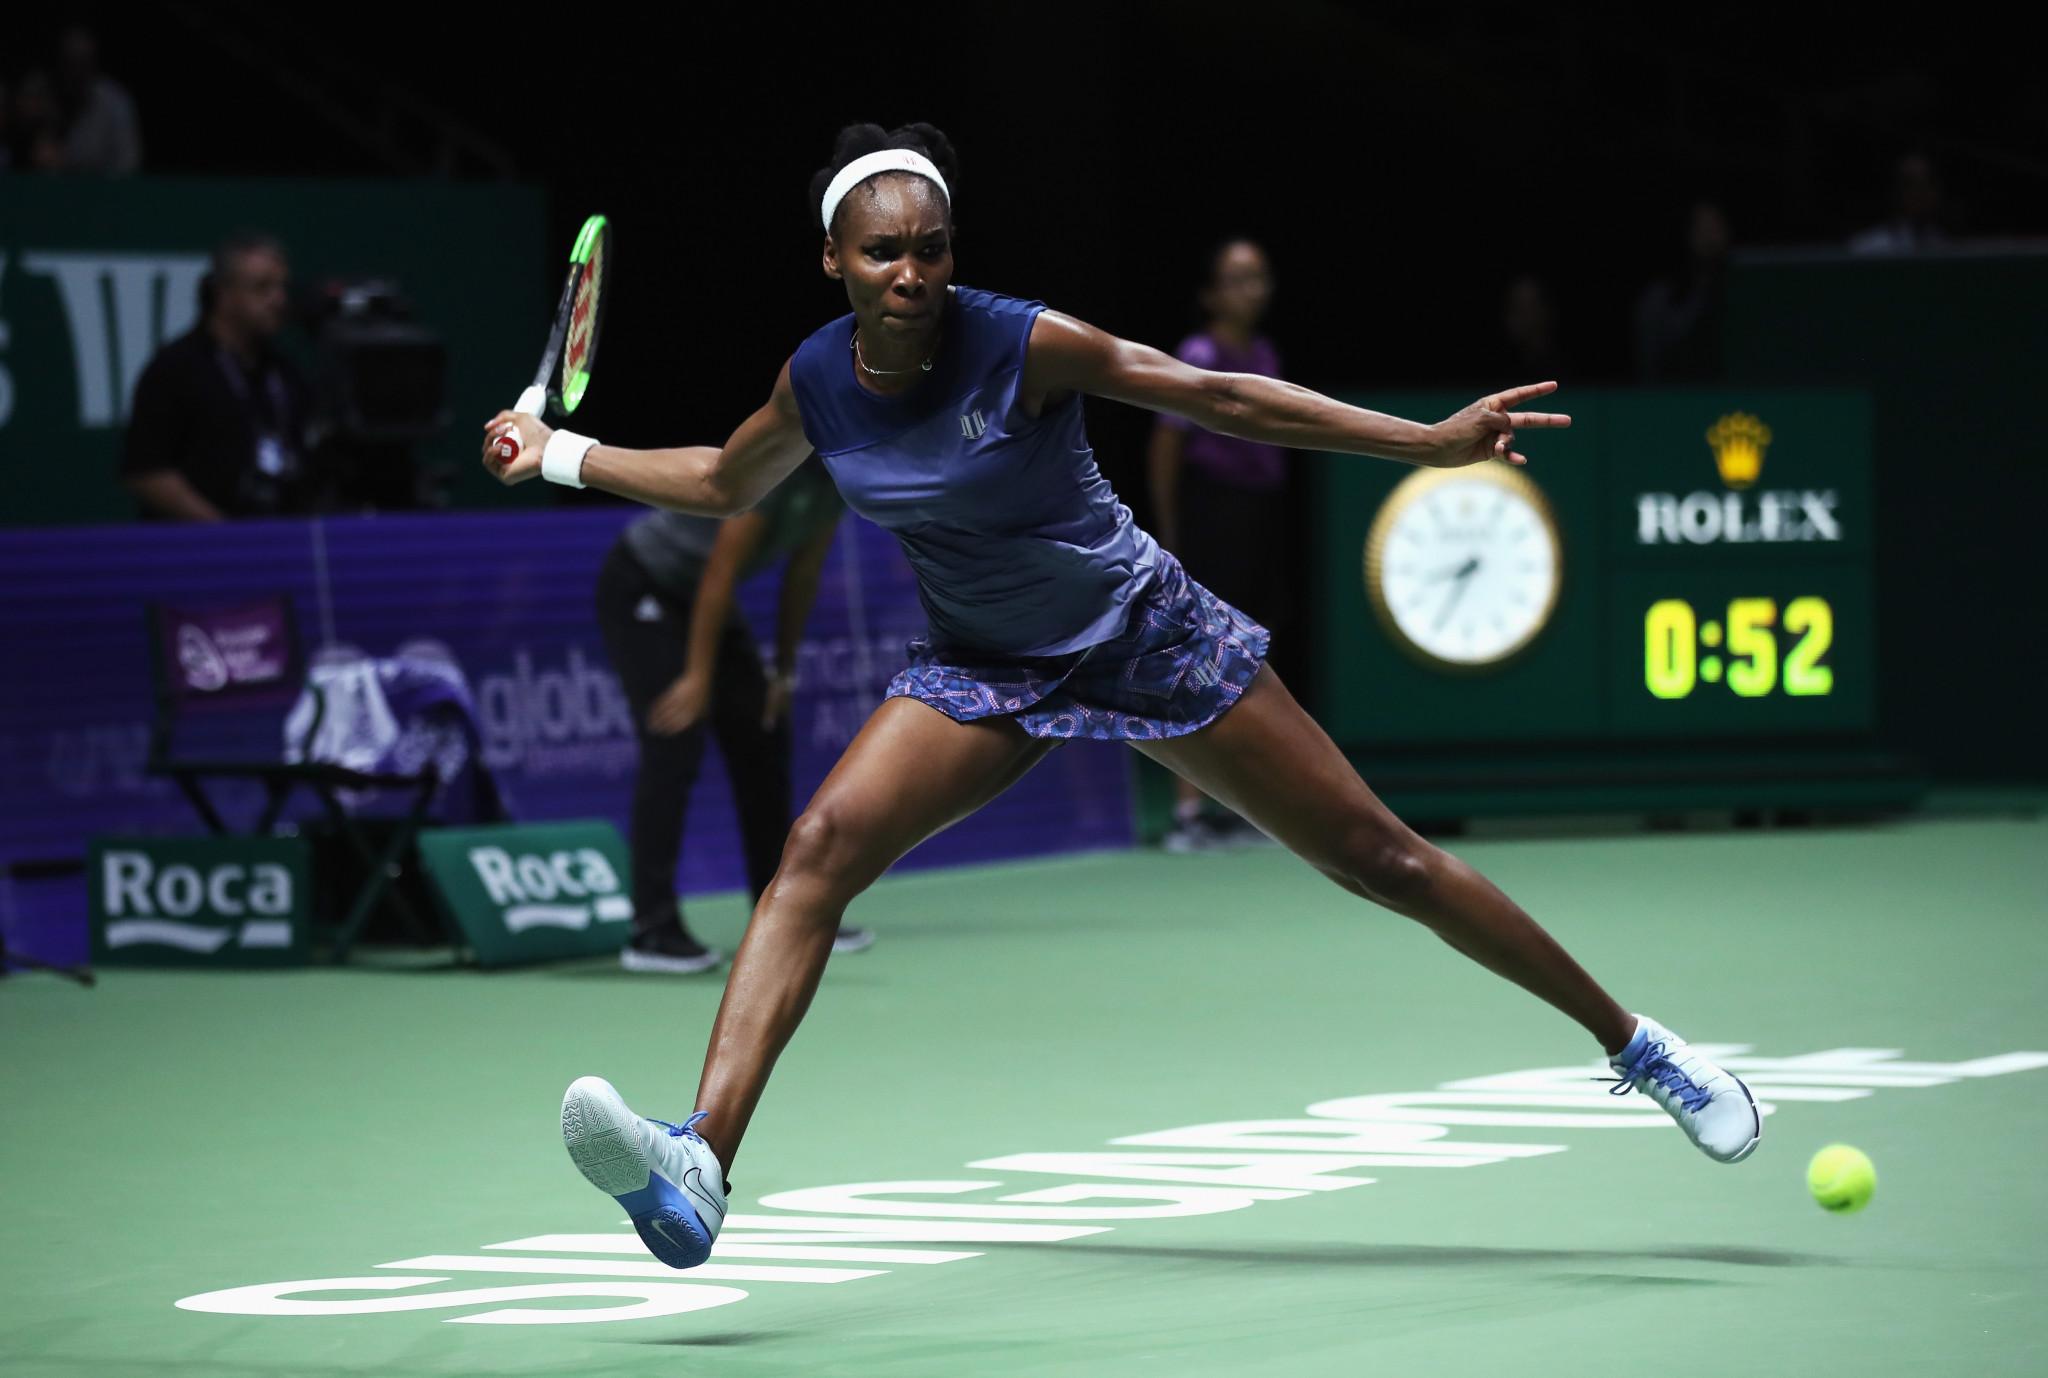 America's Venus Williams battled hard but was ultimately well beaten by her Danish opponent Caroline Wozniacki ©Getty Images